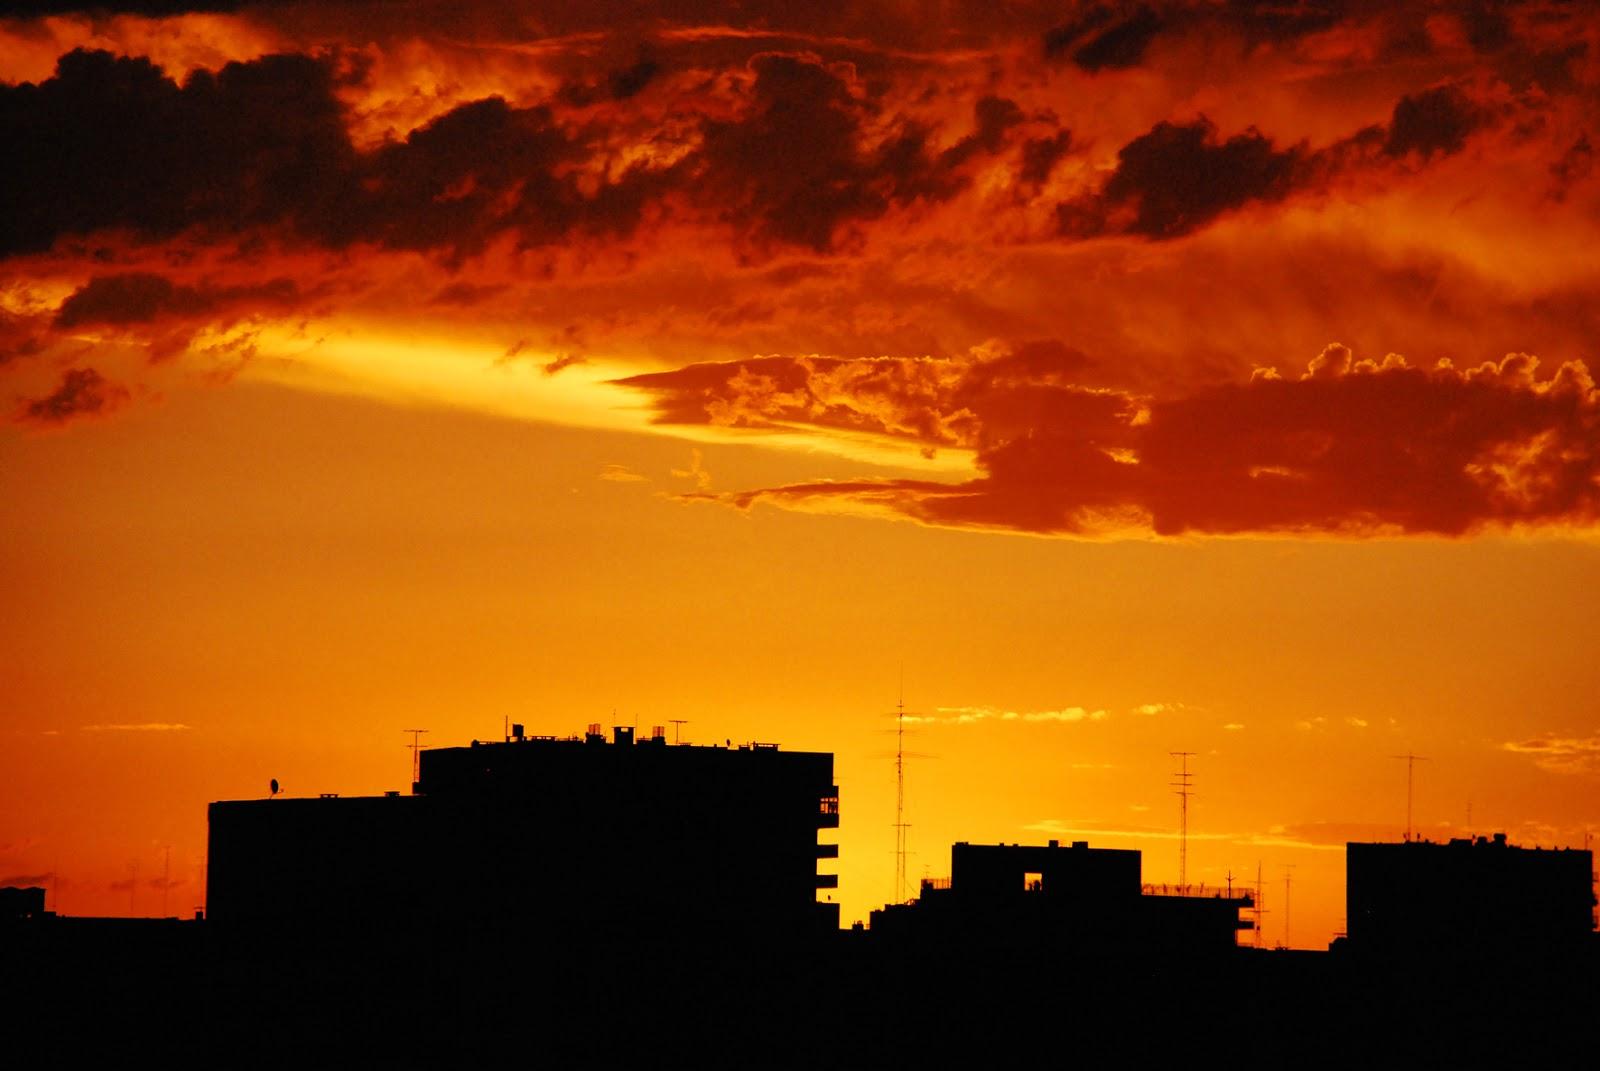 http://2.bp.blogspot.com/-UvJ_J9YRxpM/ULUaqBeXzCI/AAAAAAAAFQI/tQ9gLjfSnok/s1600/Bello+atardecer+en+la+ciudad.jpg